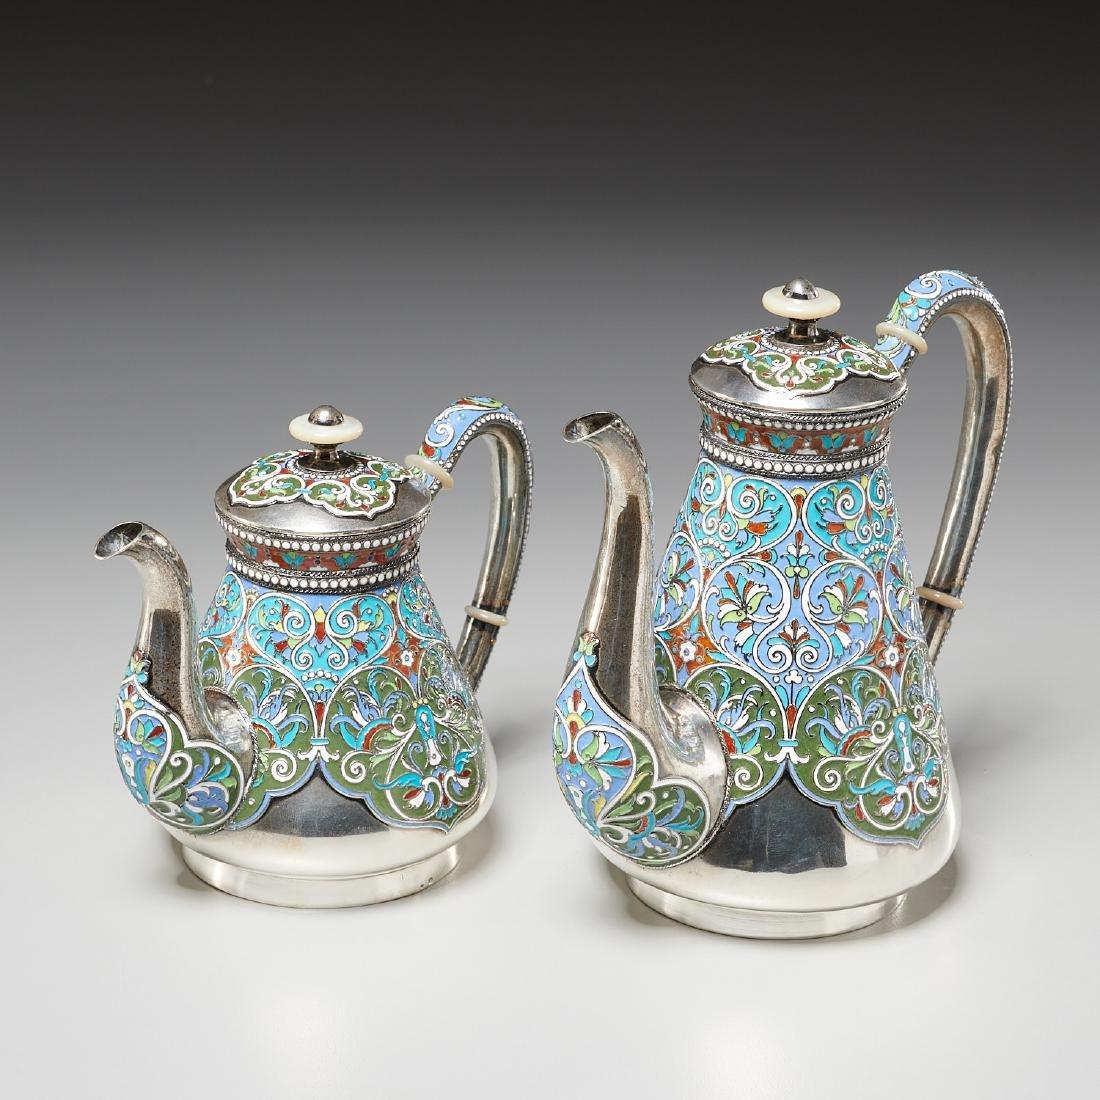 Vasily Agafonov enameled silver coffee service - 2